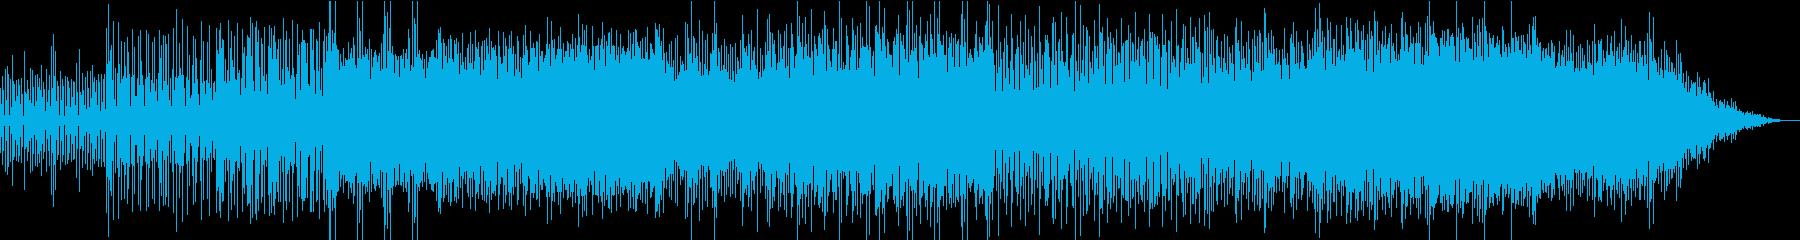 Downtempo Techno Popの再生済みの波形